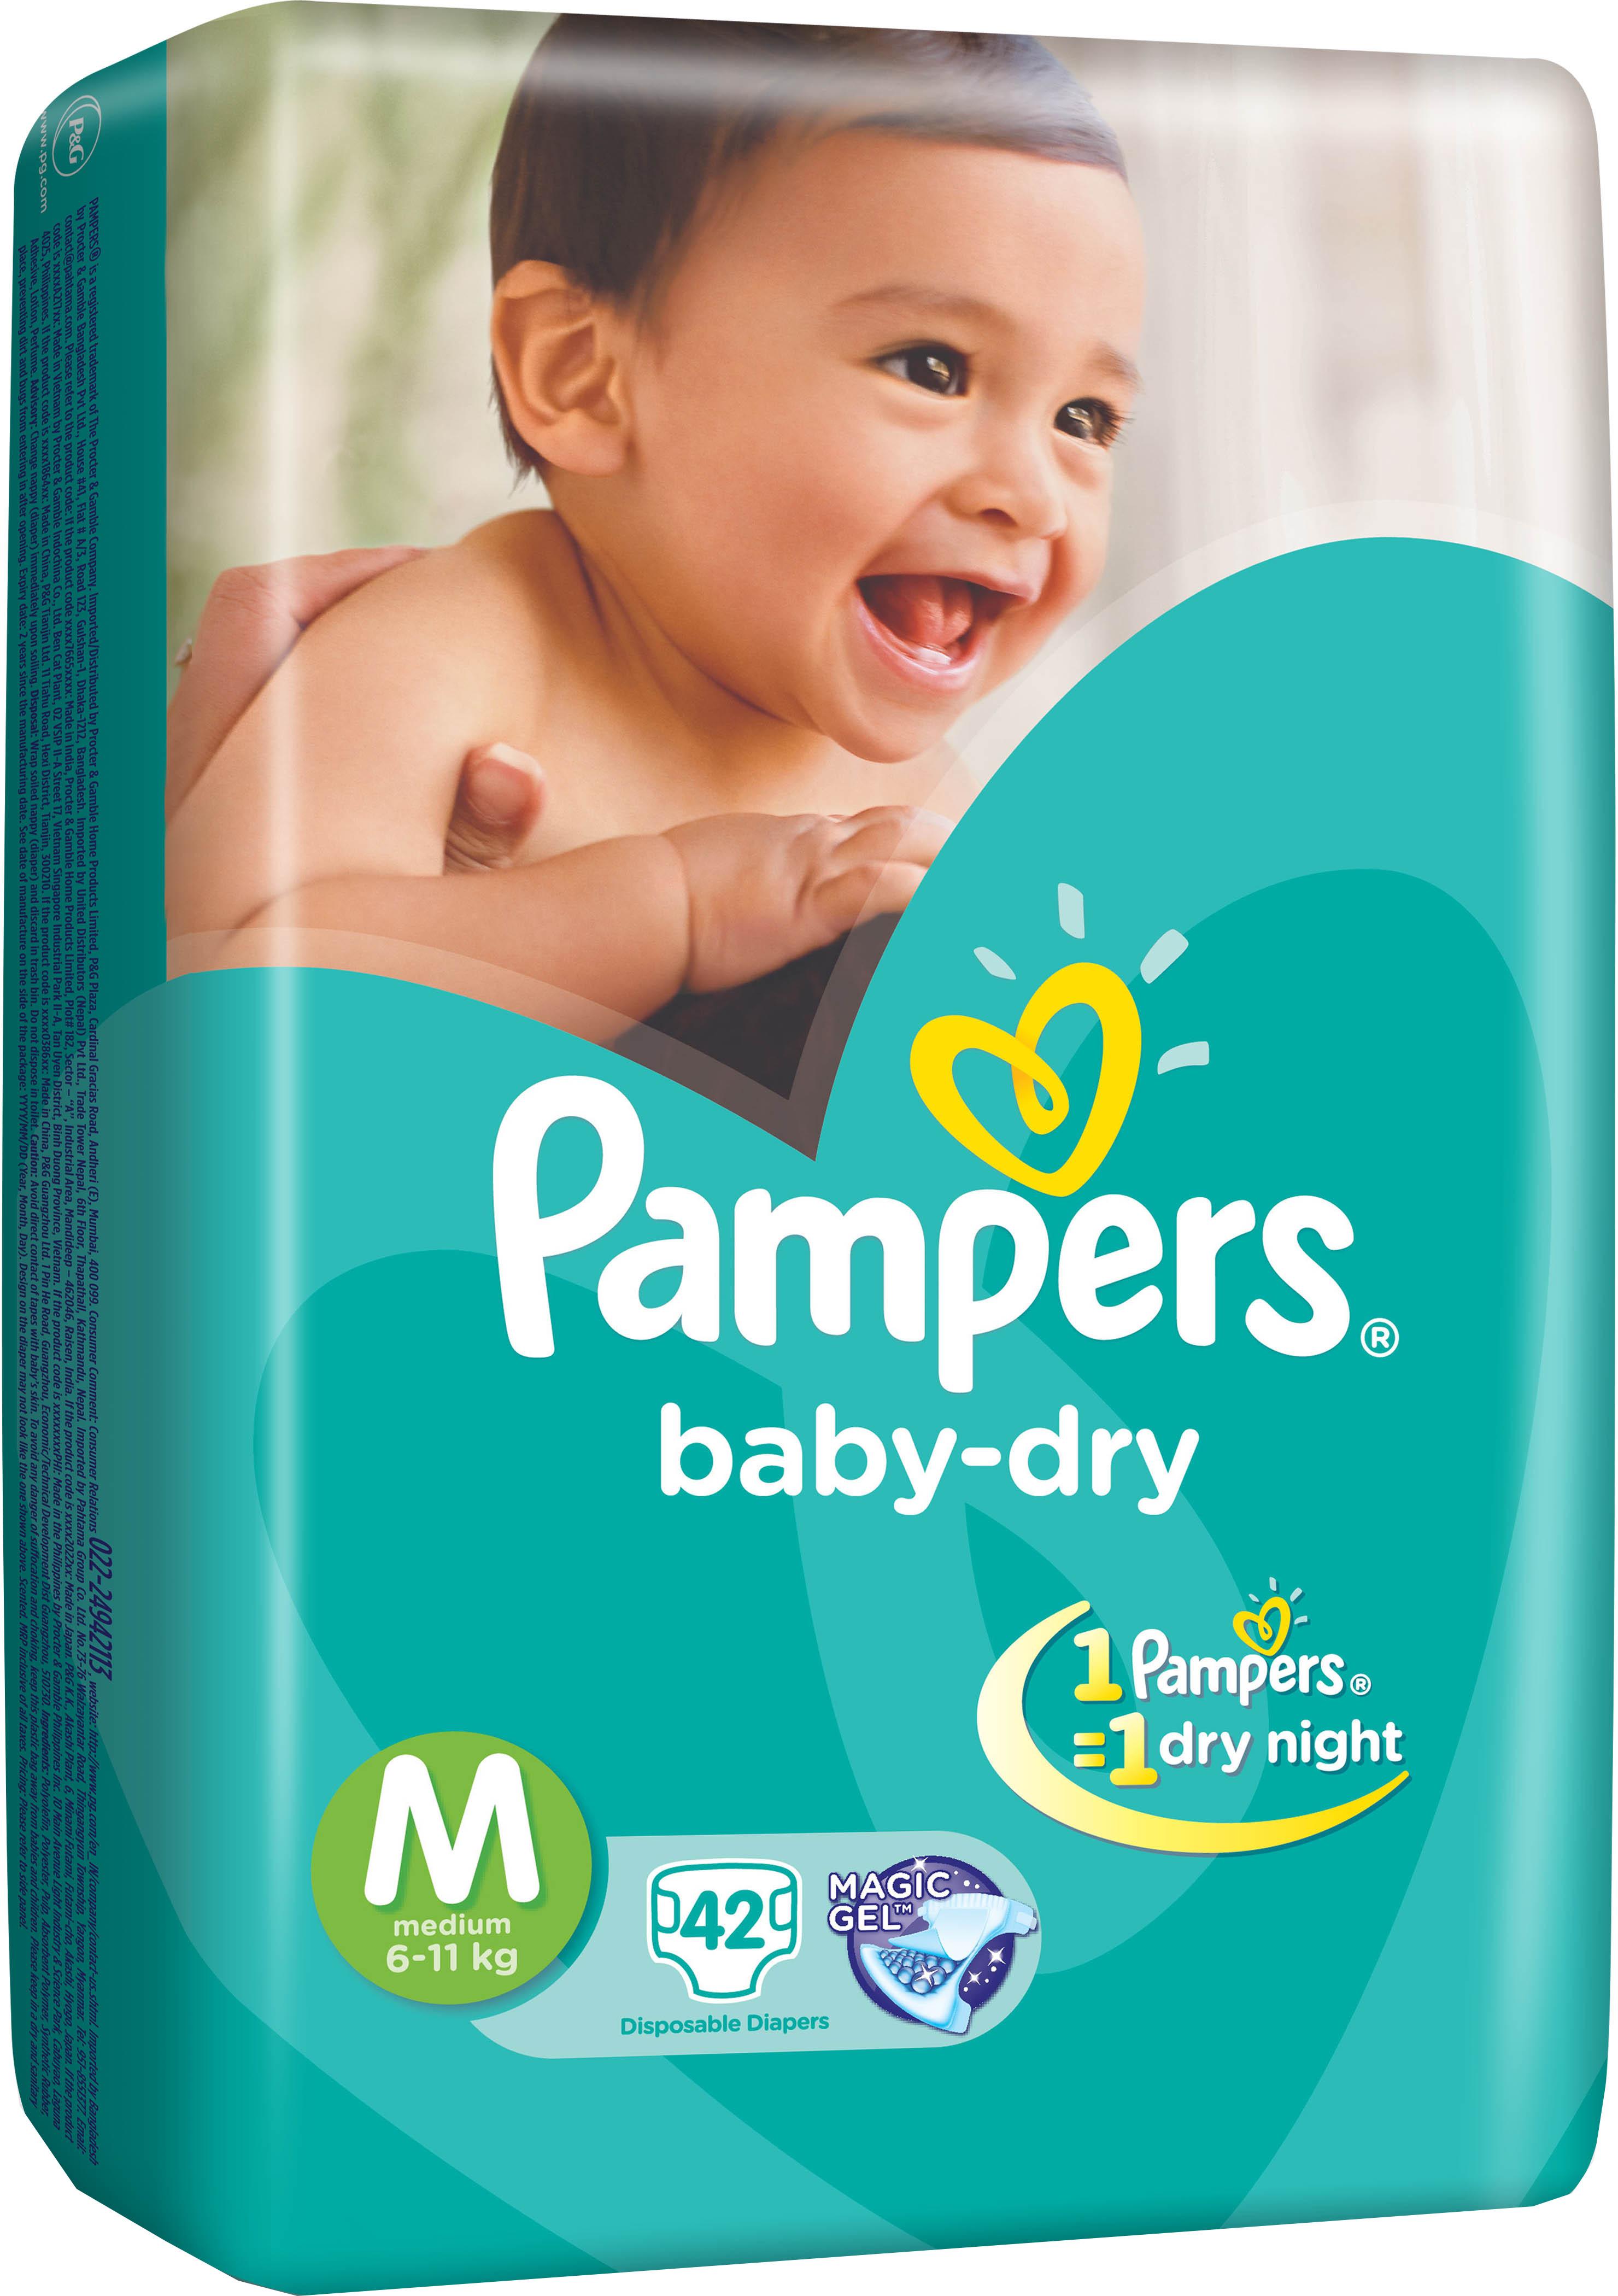 diaper pampers images - usseek.com